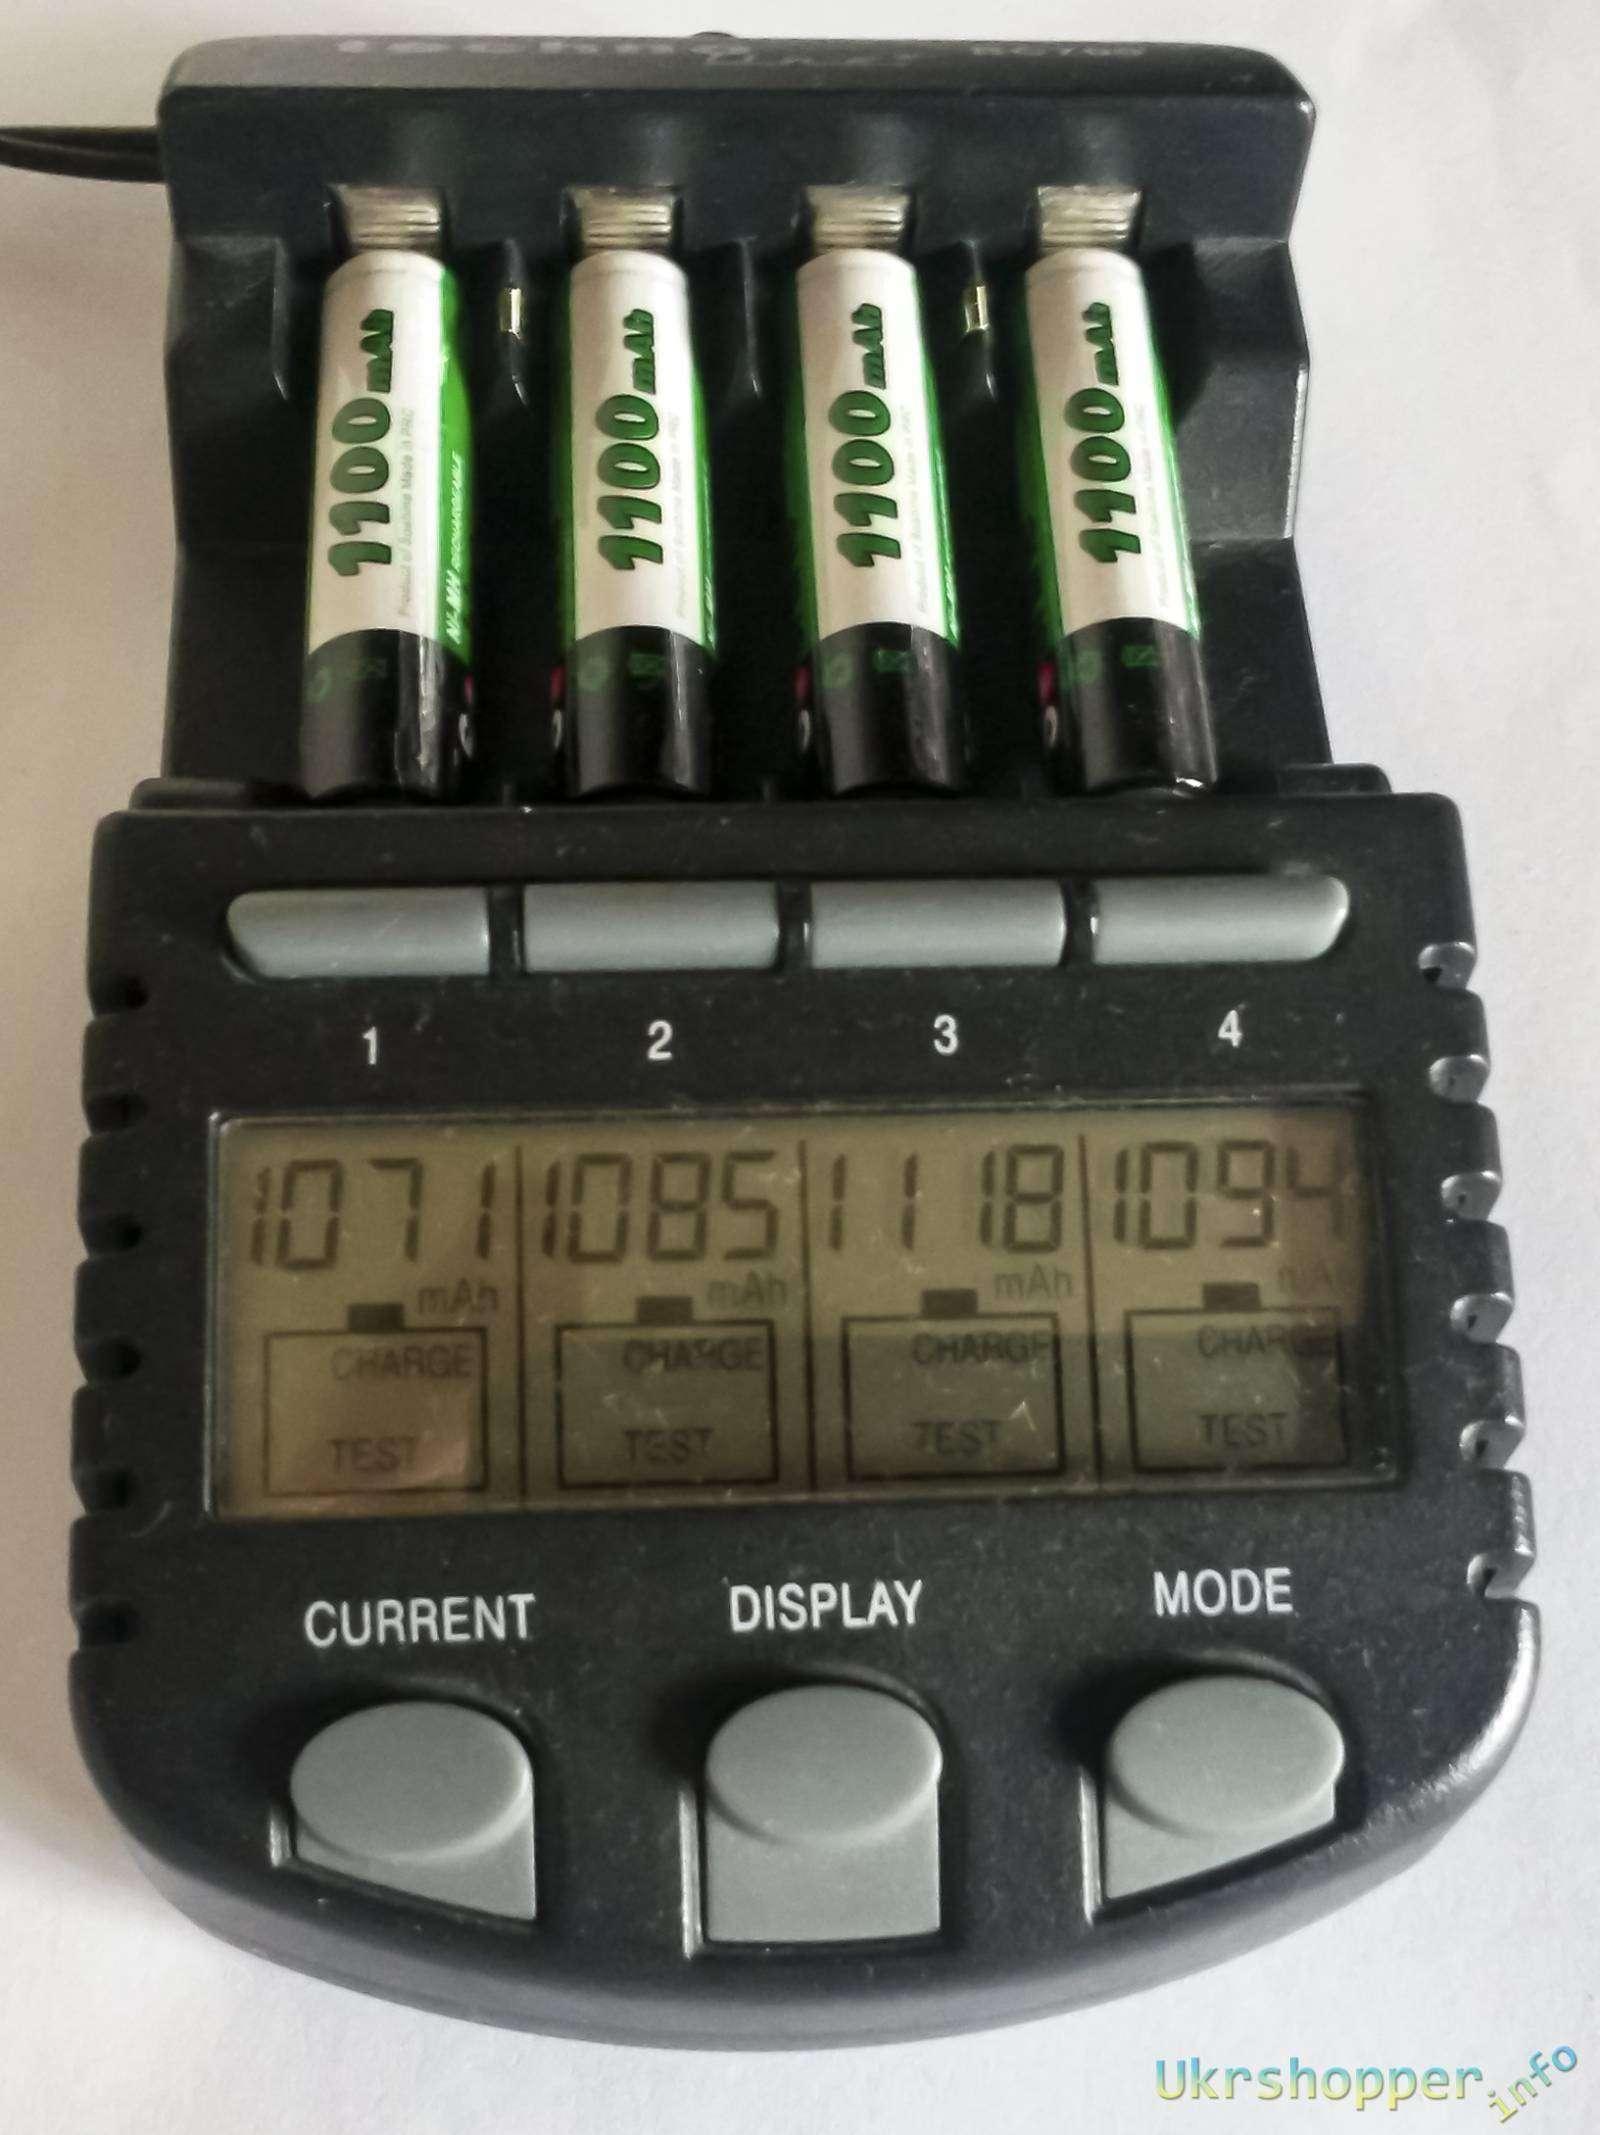 DealExtreme: Аккумуляторы Soshine AAA на 1100 мАч